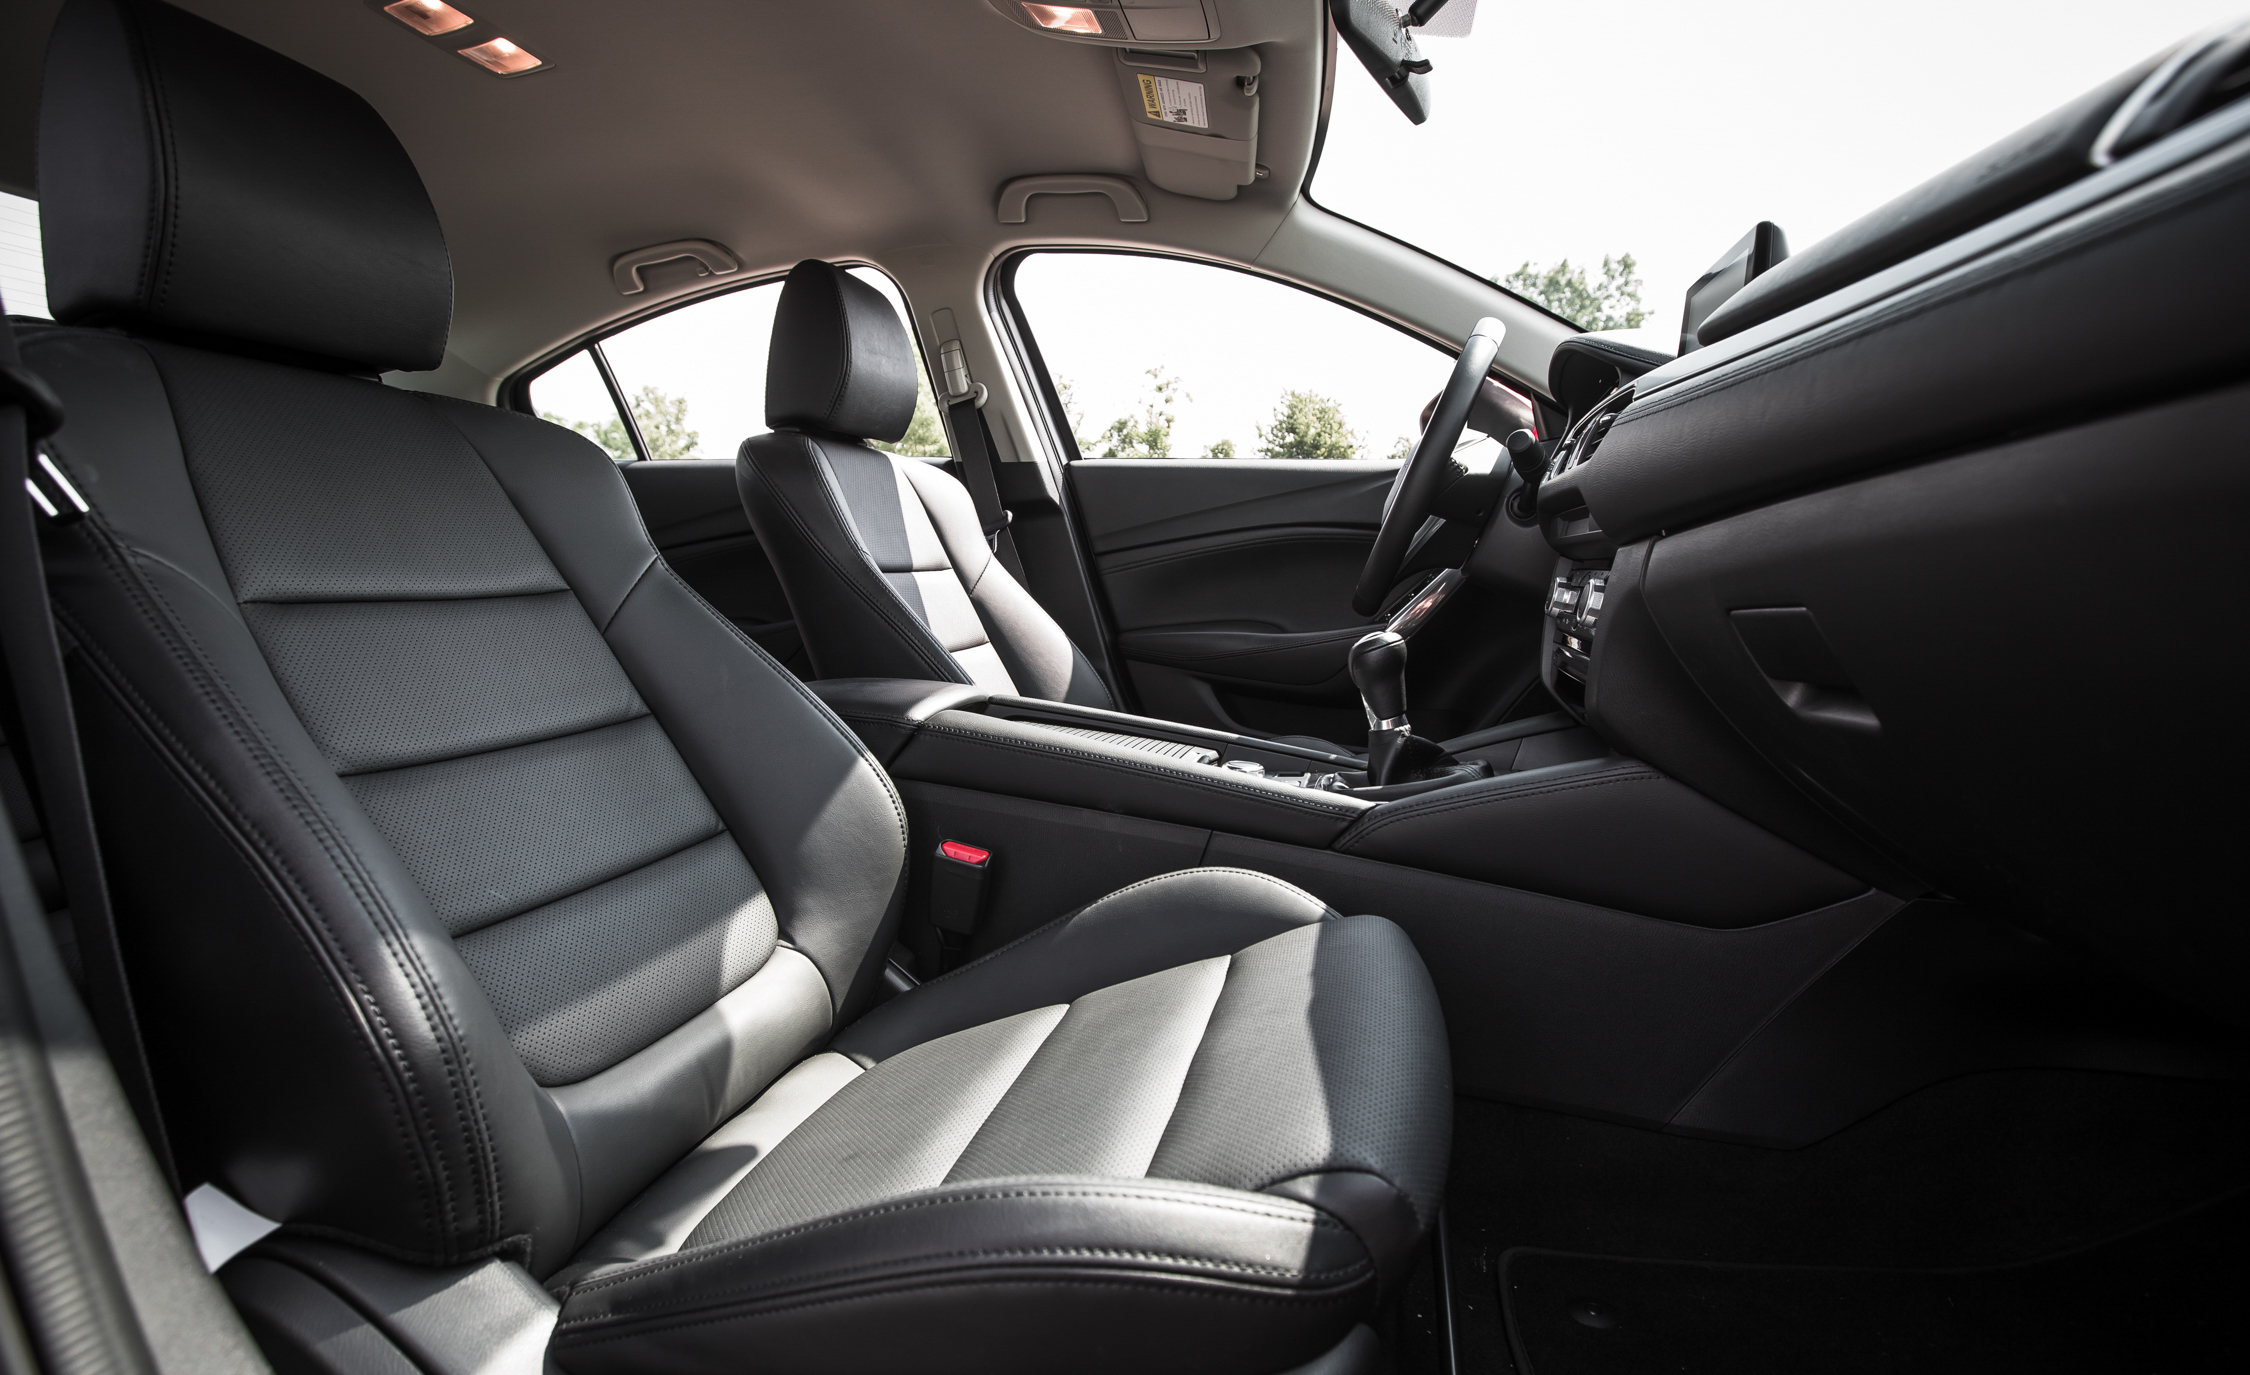 2016 Mazda 6 Touring Interior Front Passenger Seat